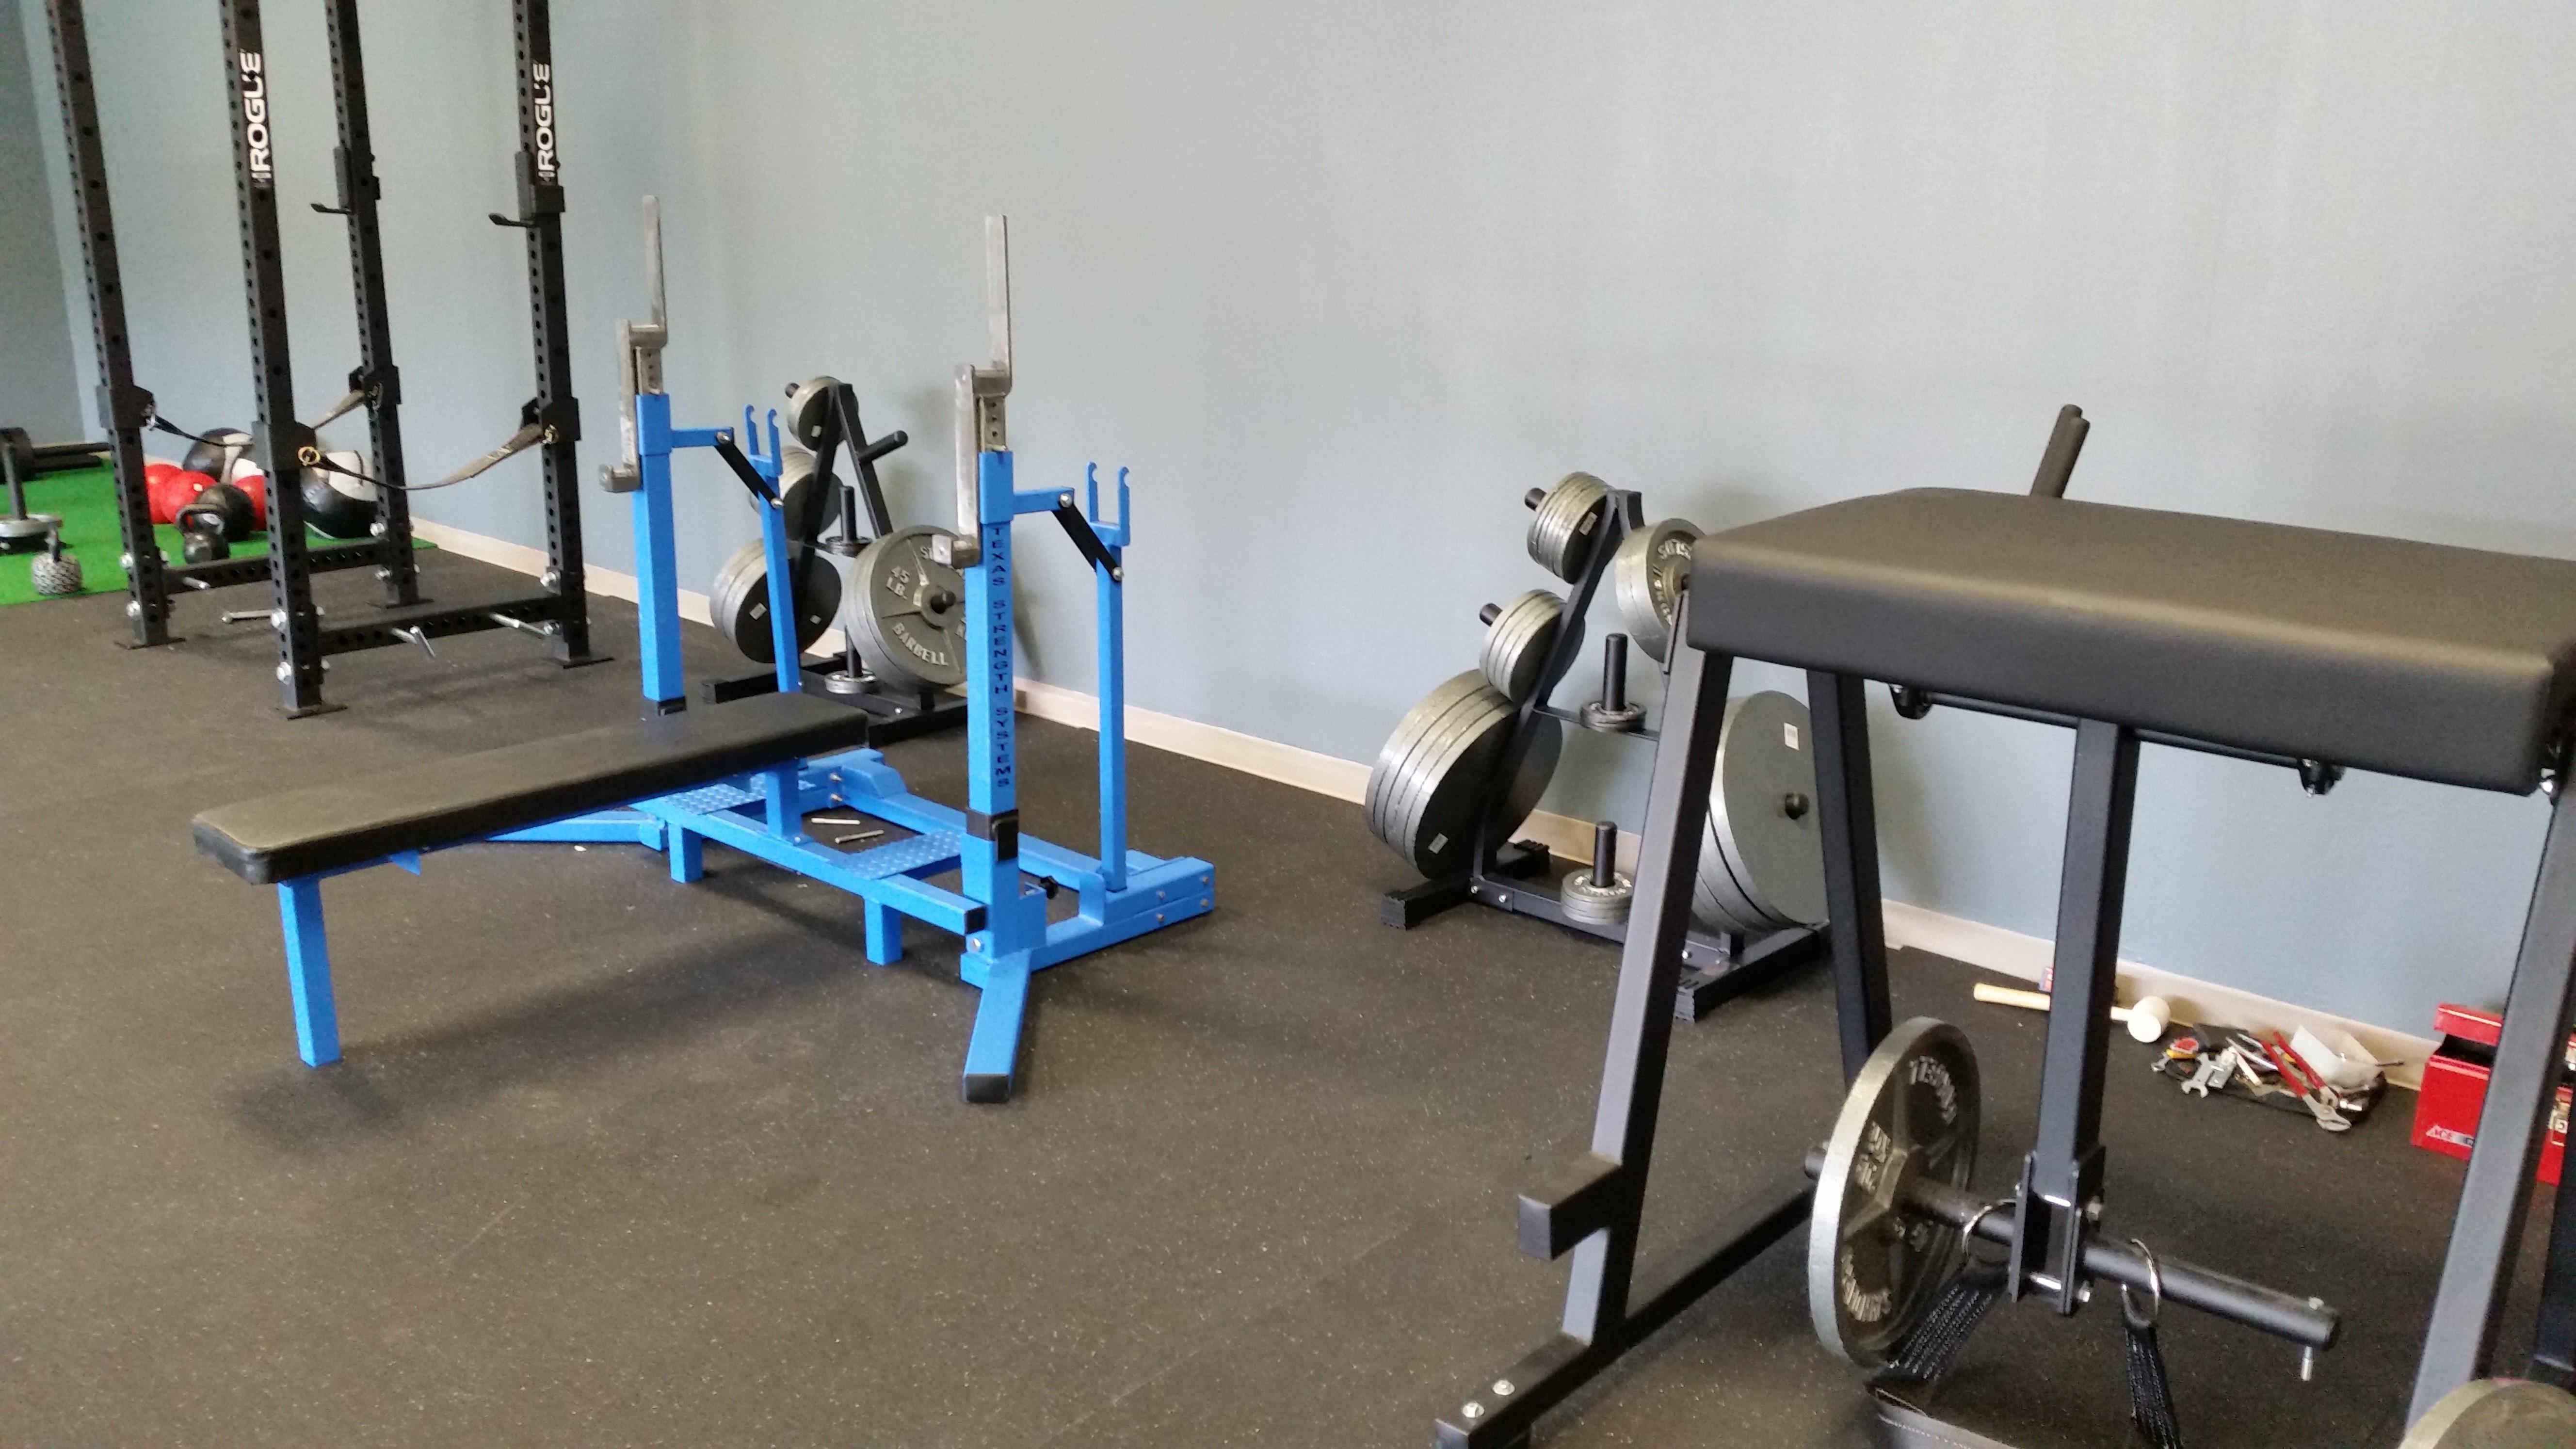 amazon sports dp outdoors rack press com performance squat olympic bench adidas